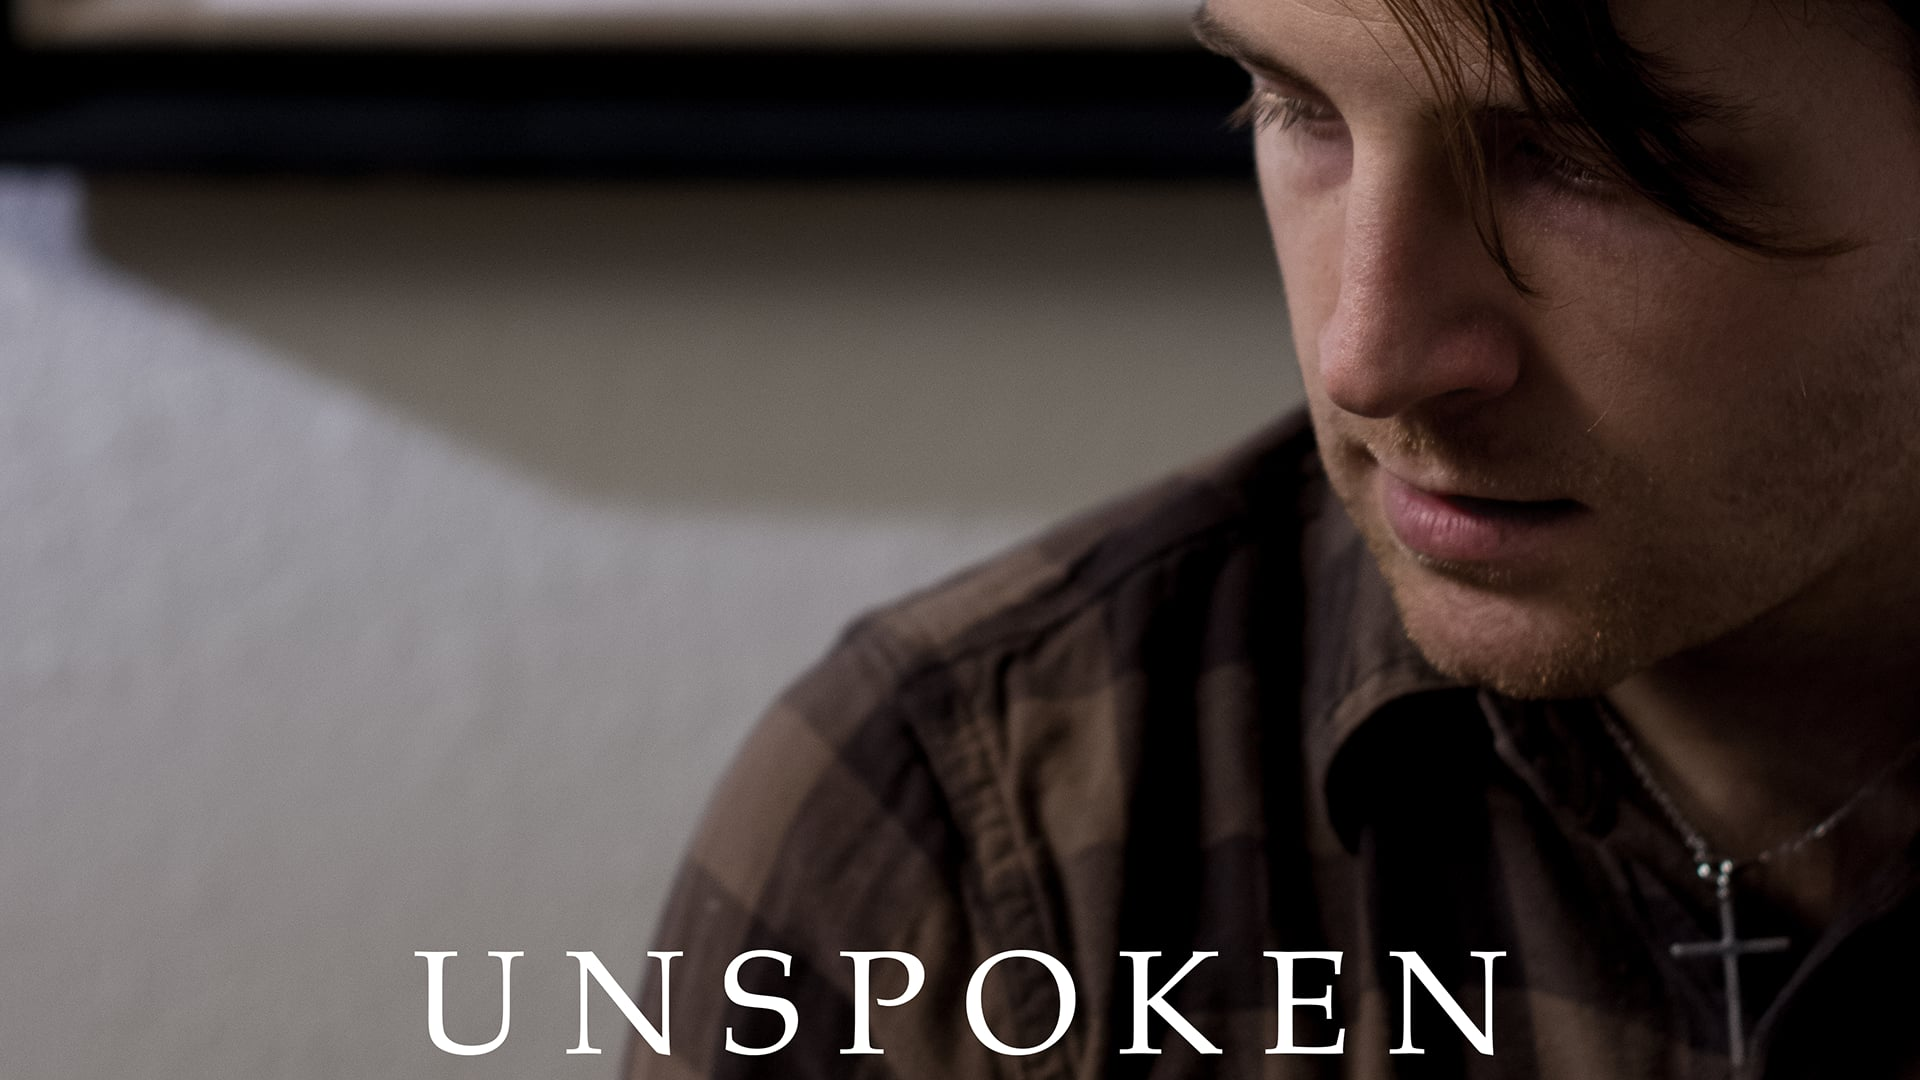 Unspoken - A Short Film by Austin Smagalski